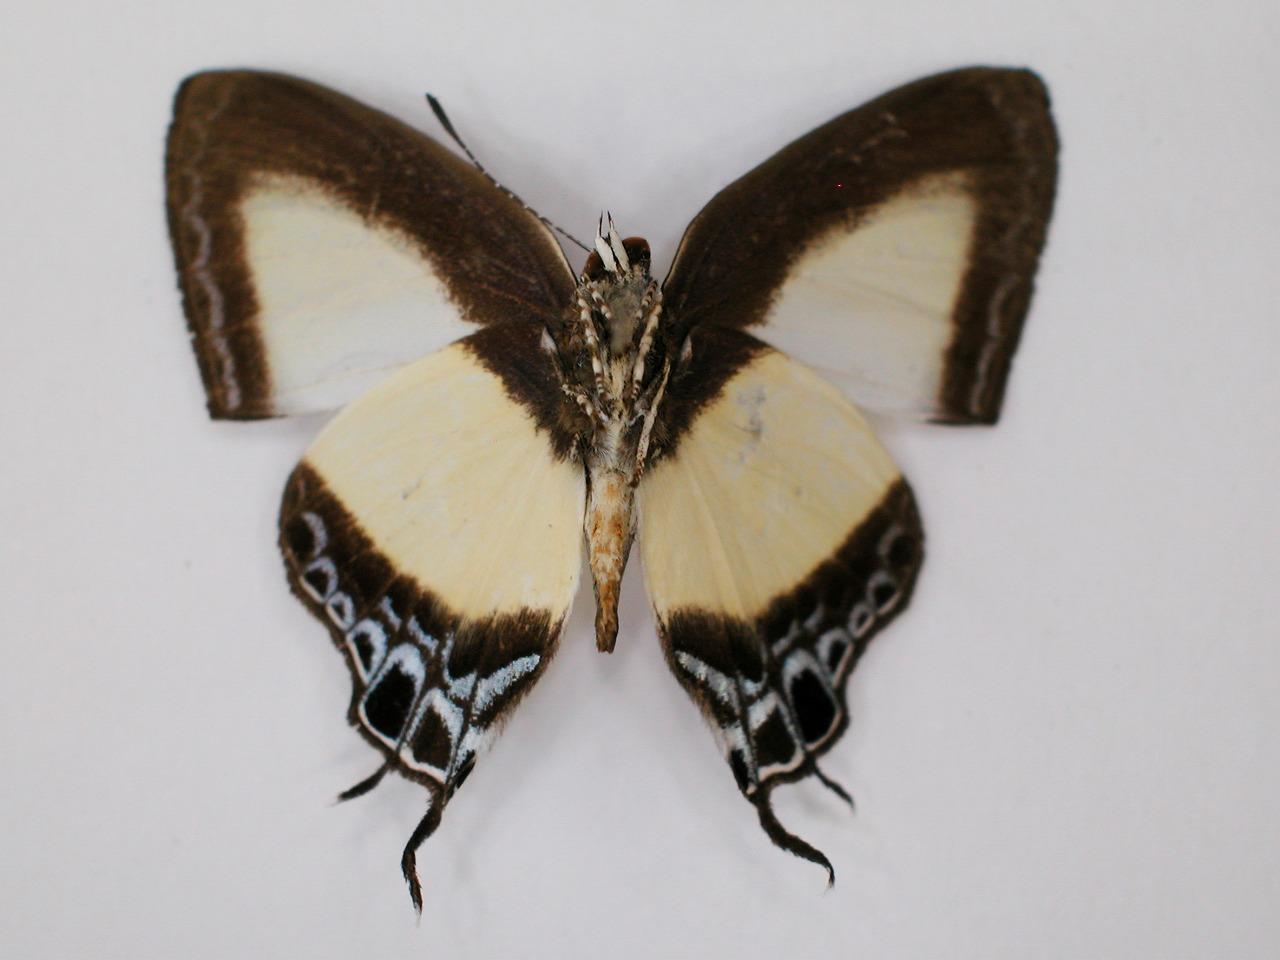 https://www.hitohaku.jp/material/l-material/butterfly-wing/5-lycaenidae/B1-272288_B.jpg